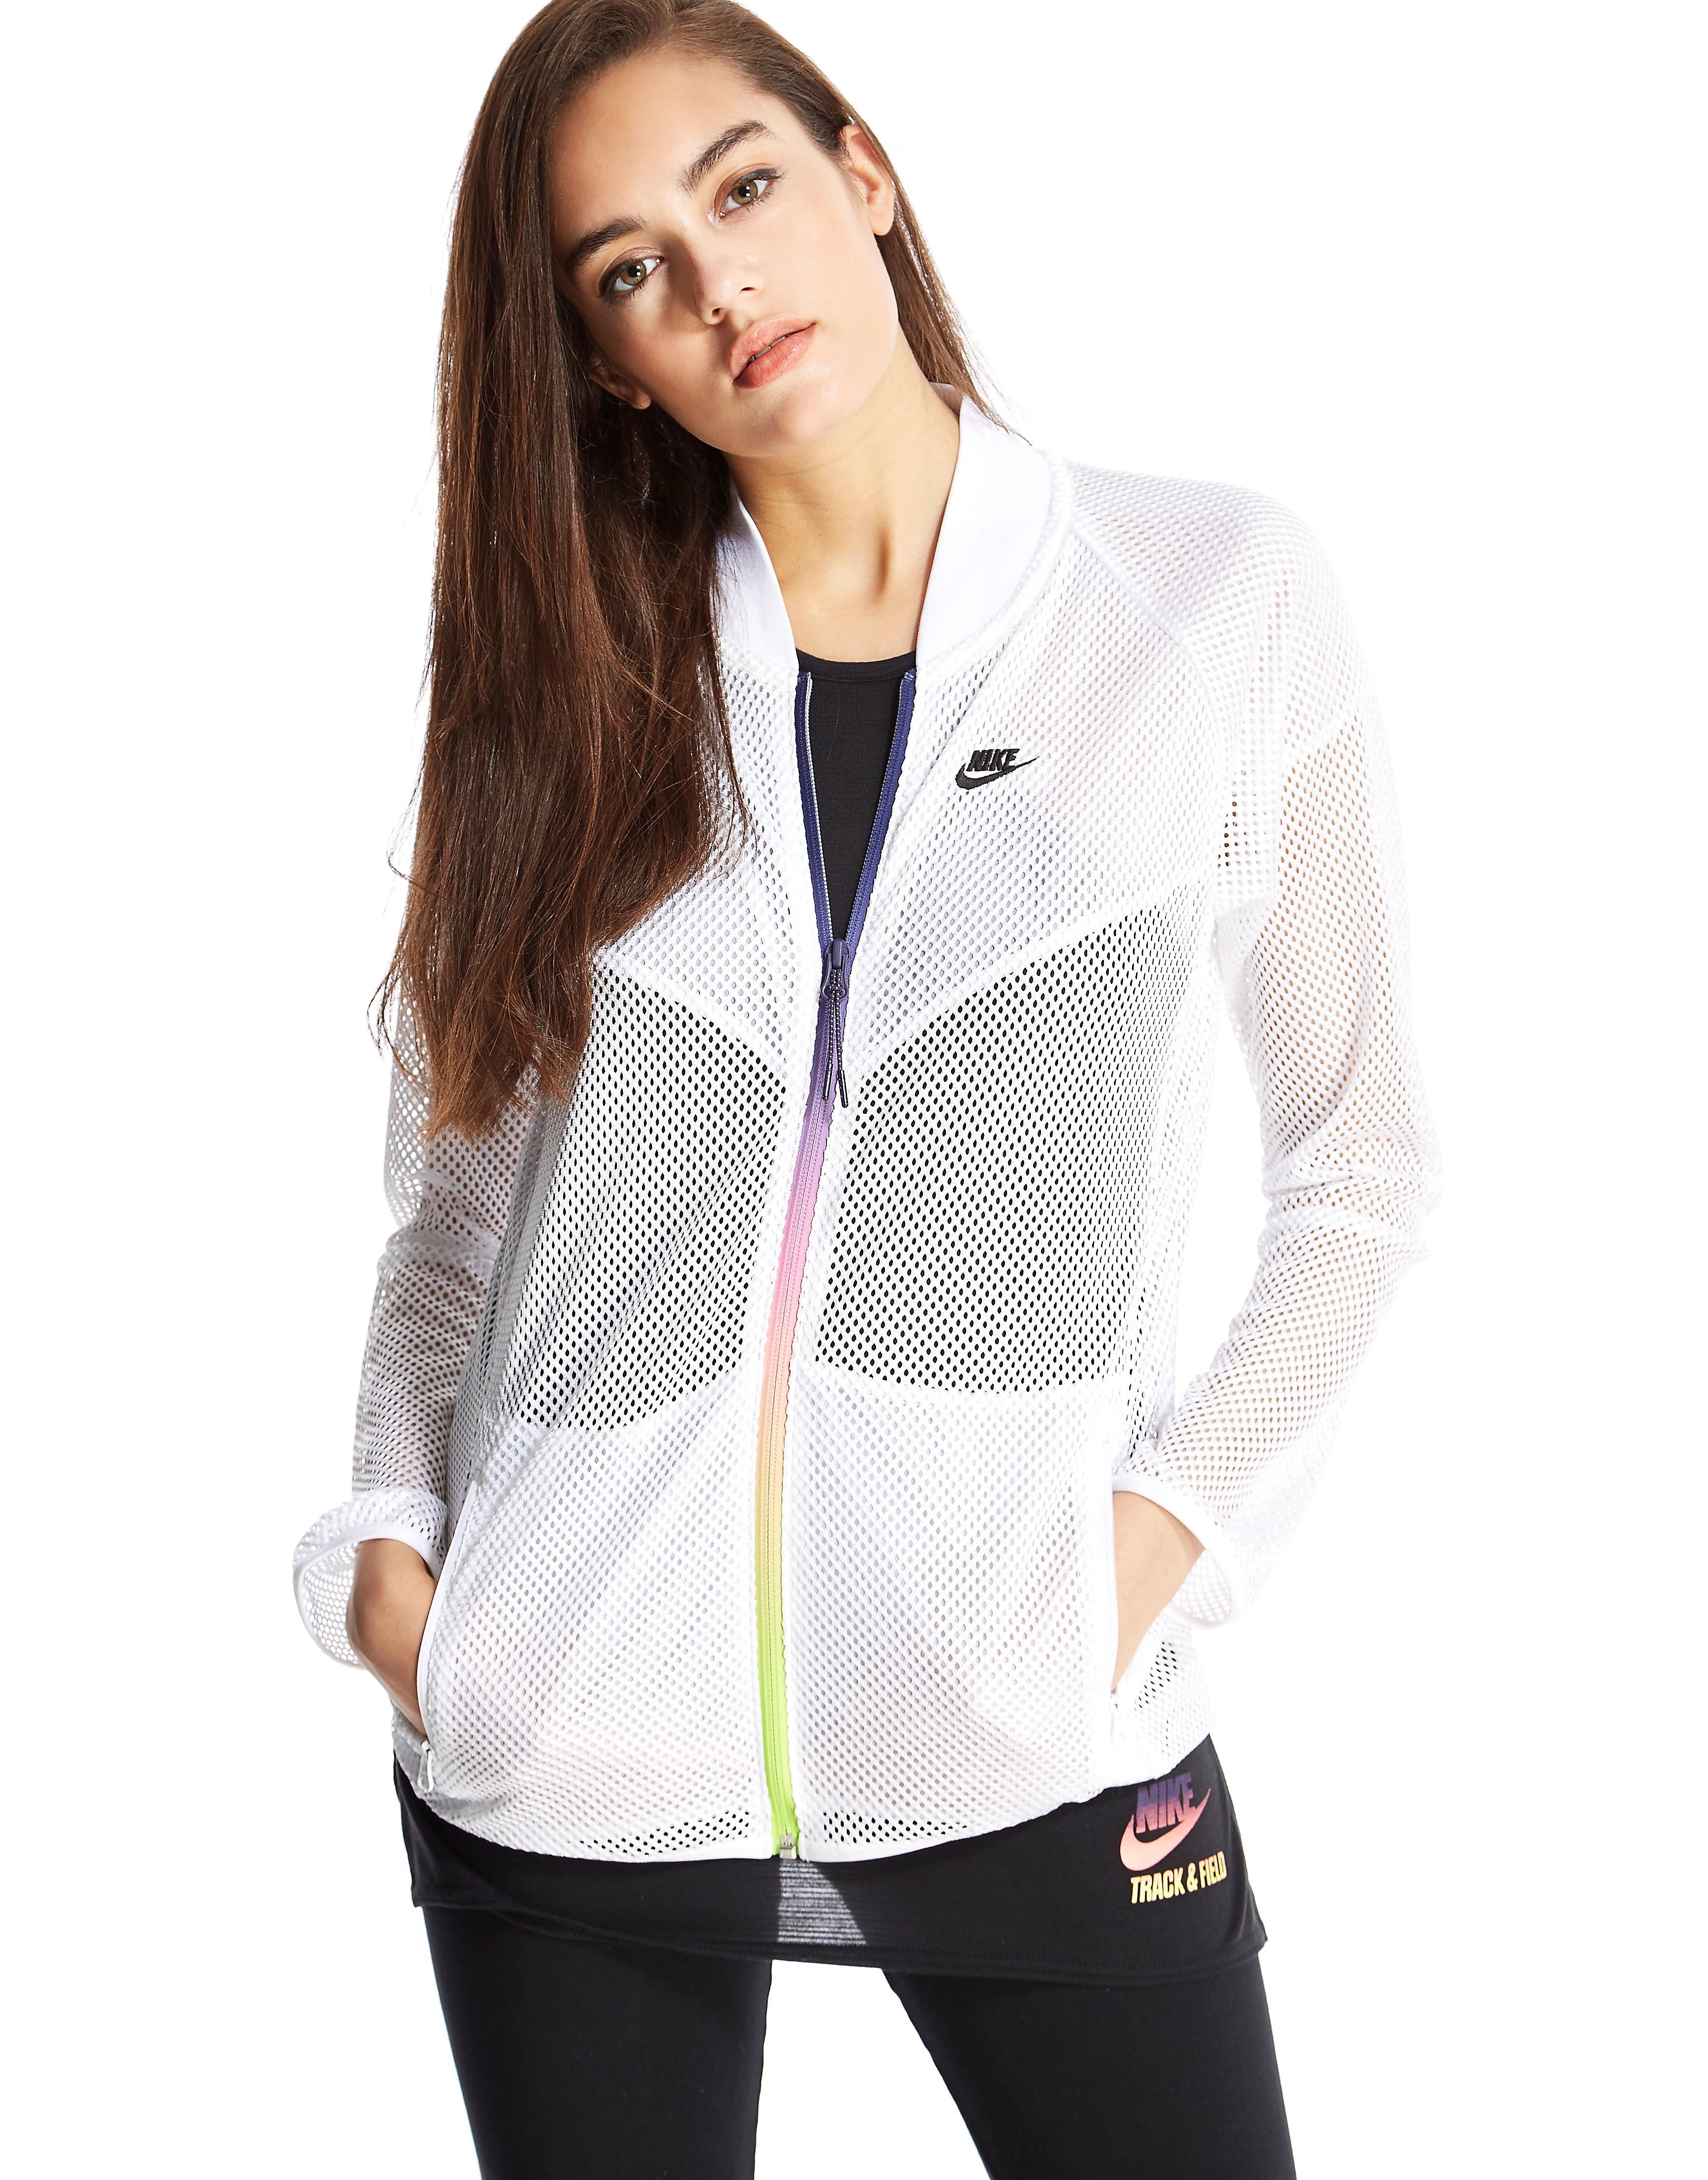 Nike Mesh Bomber Jacket - White - Womens, White